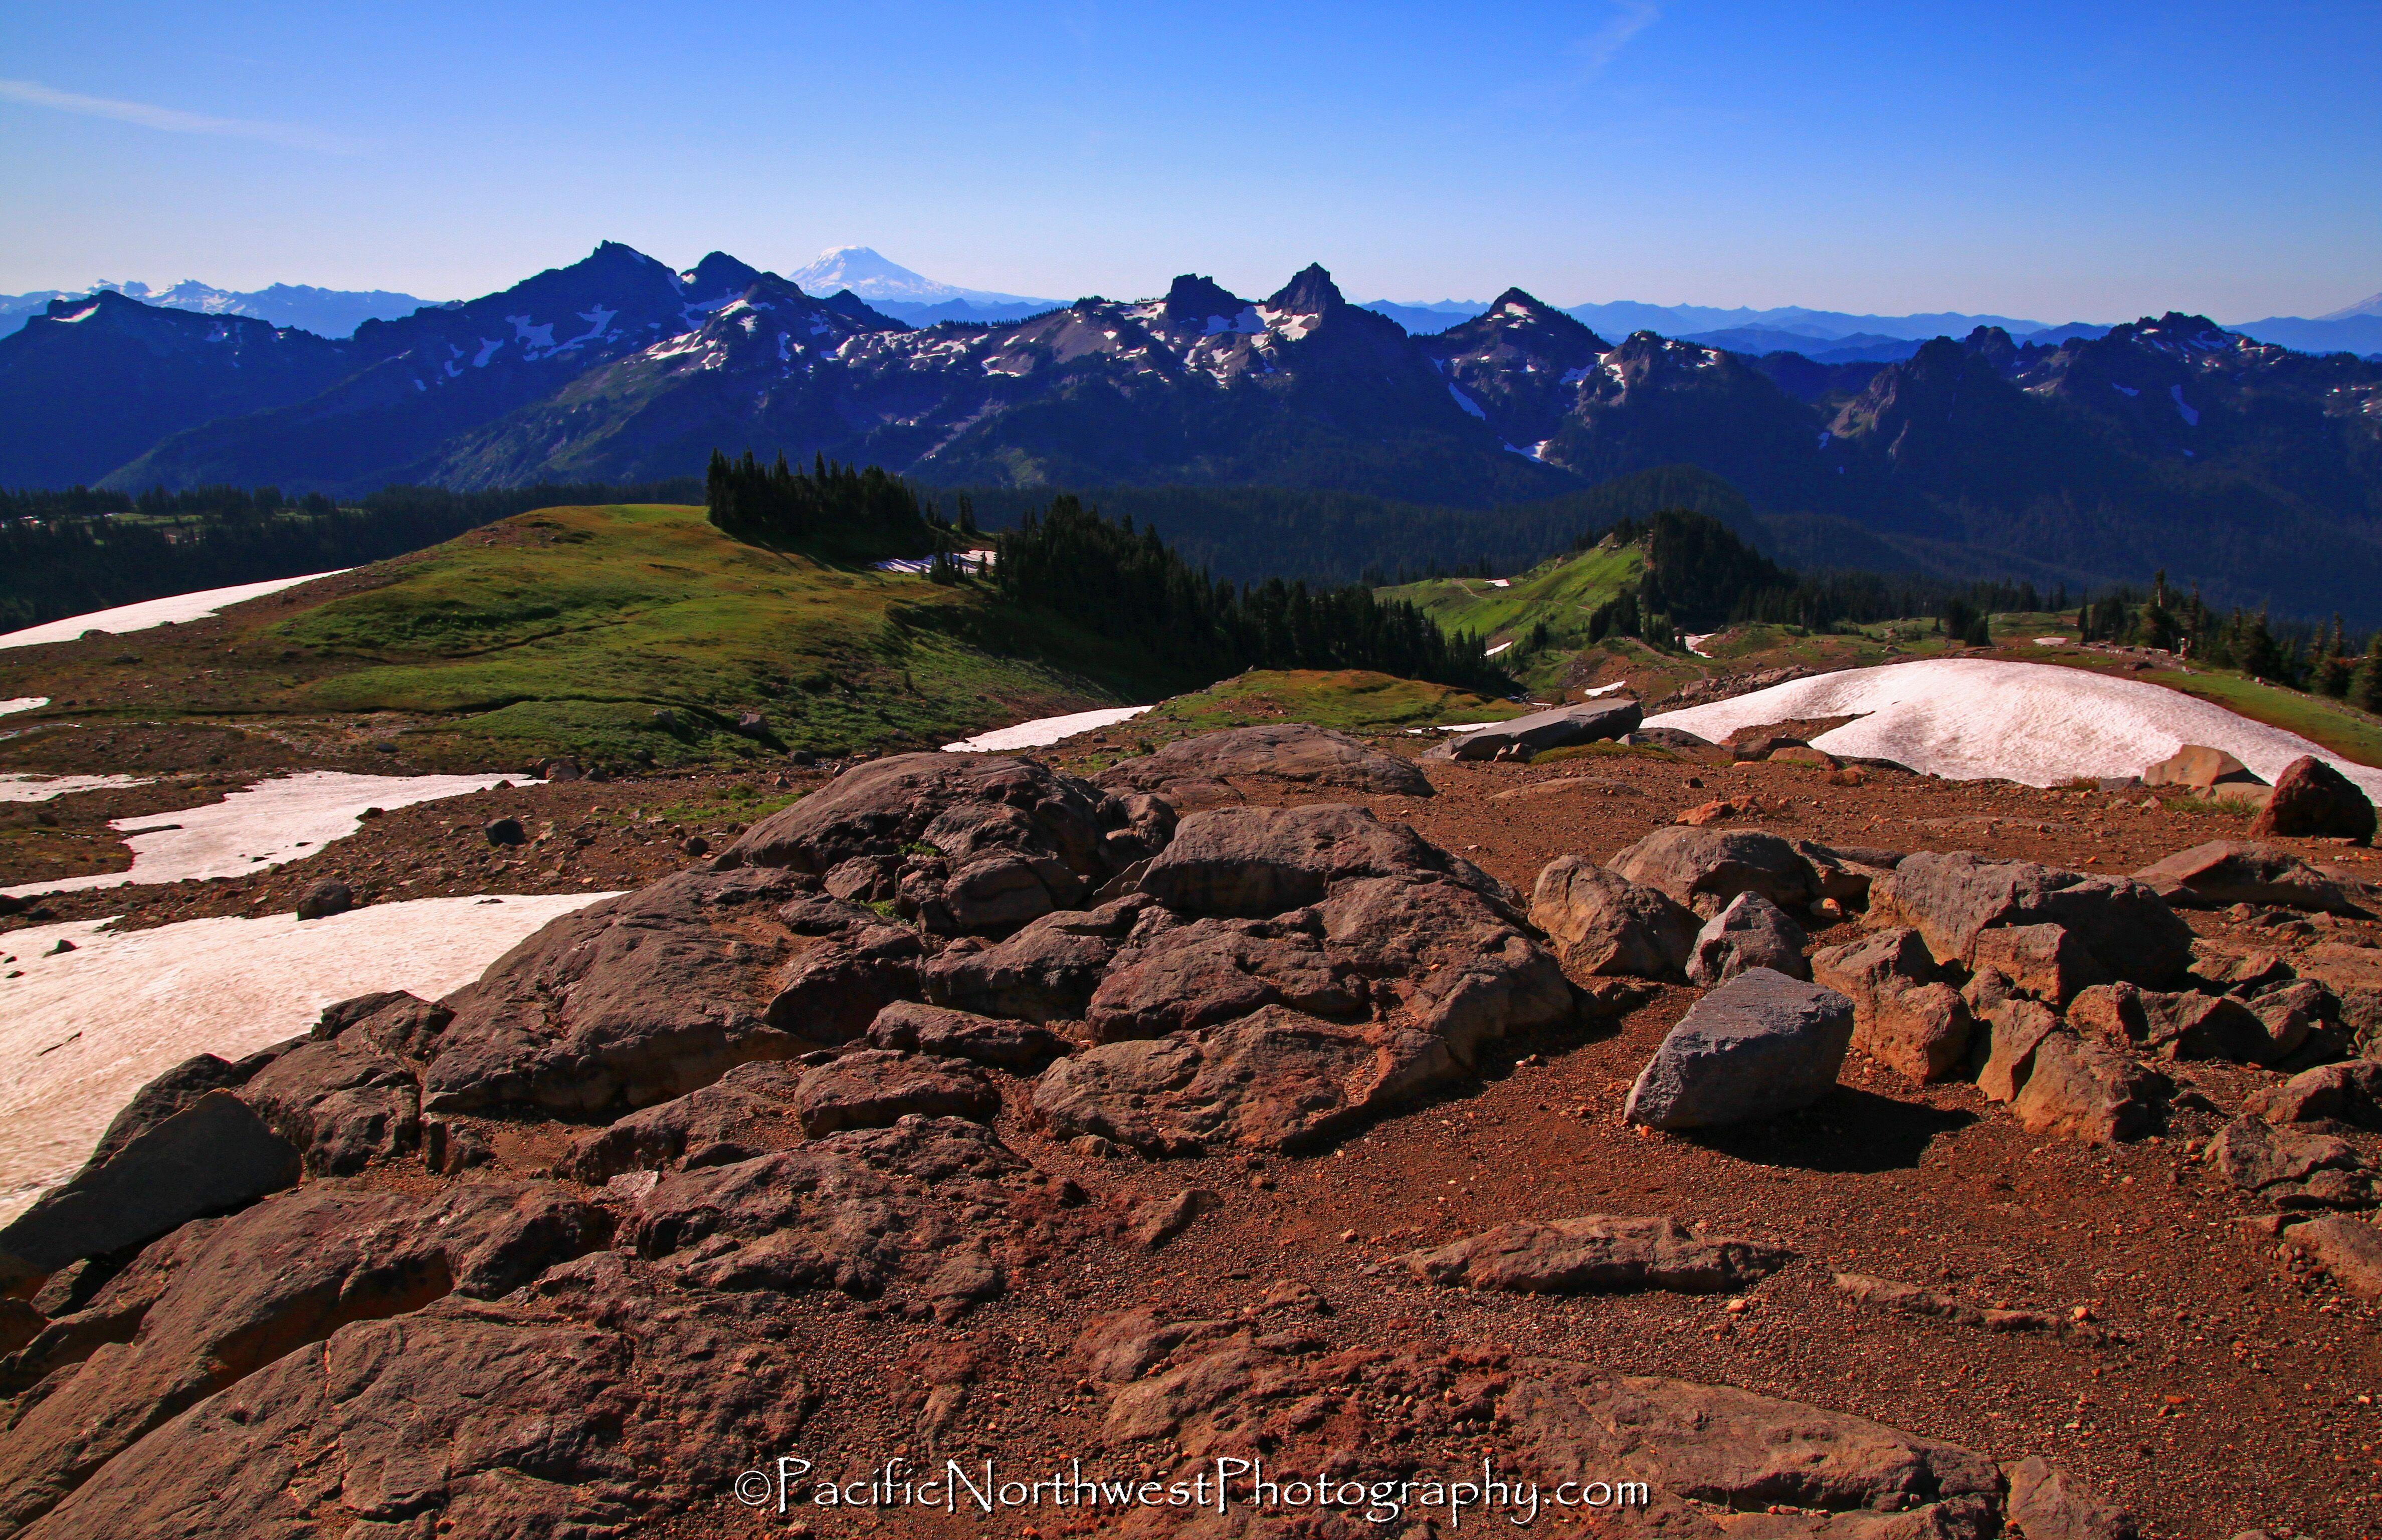 Tatoosh range with Mt. Adams in the distance